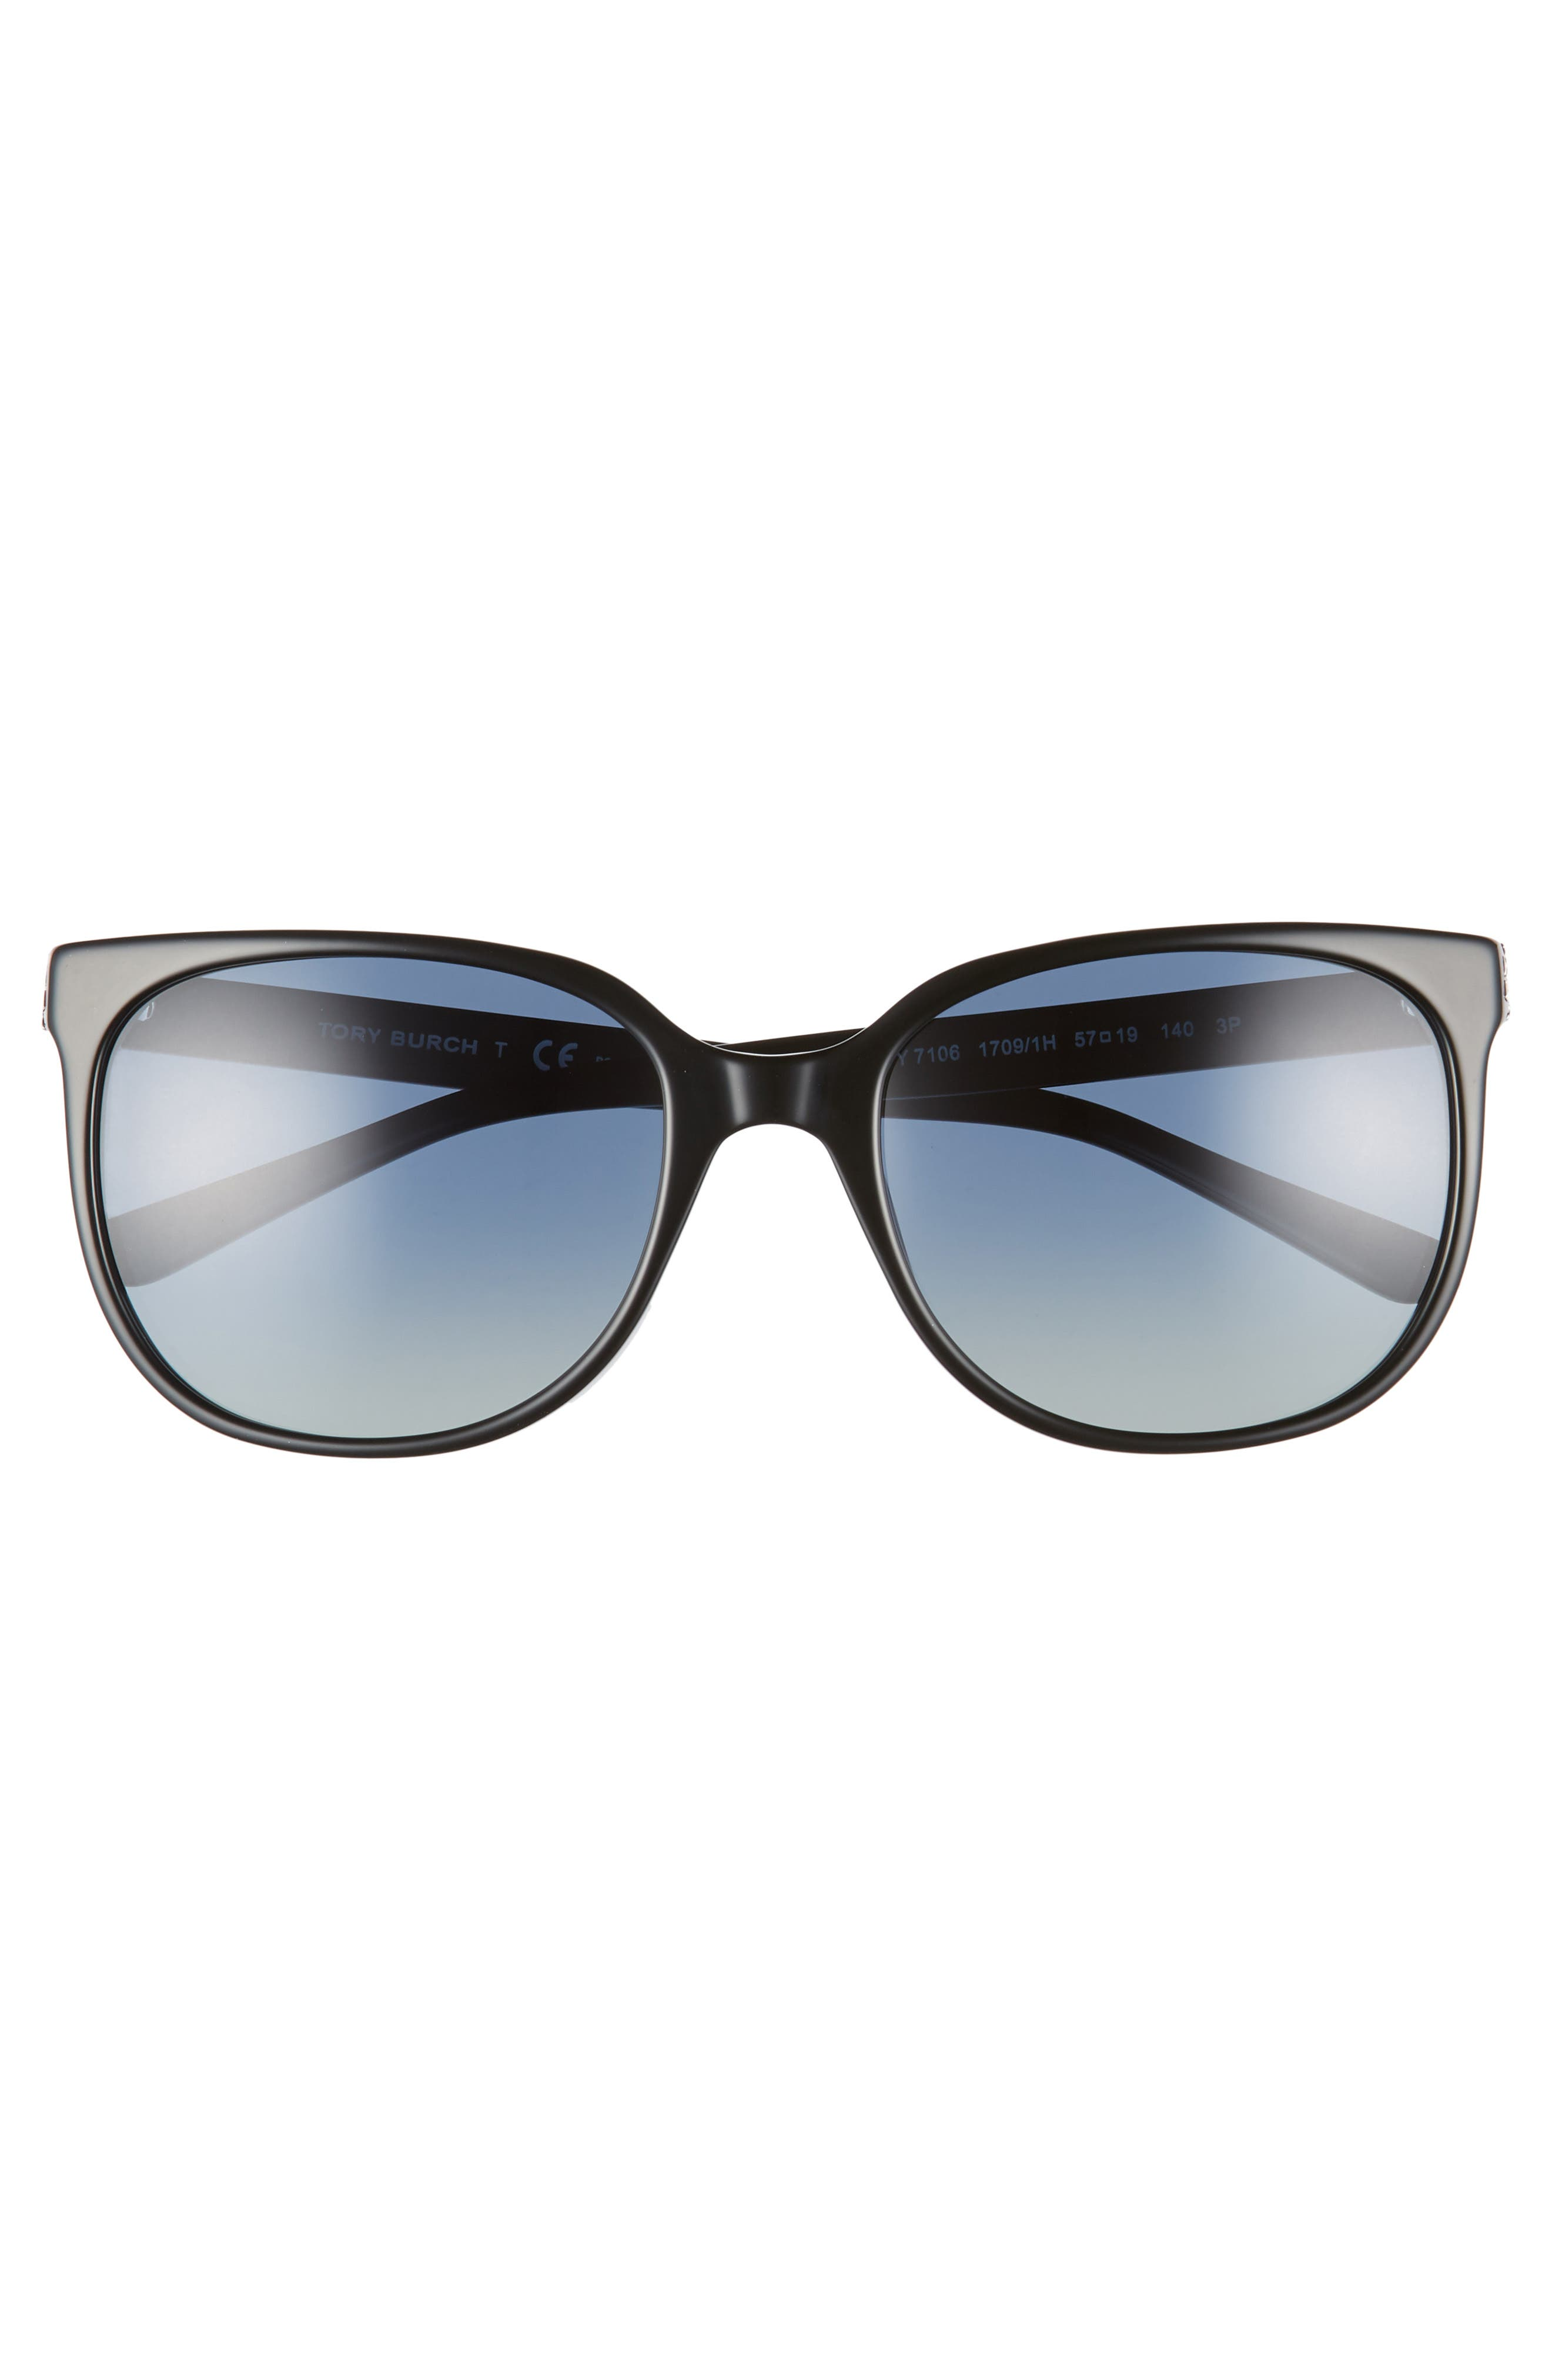 TORY BURCH, Revo 57mm Polarized Square Sunglasses, Alternate thumbnail 3, color, 001